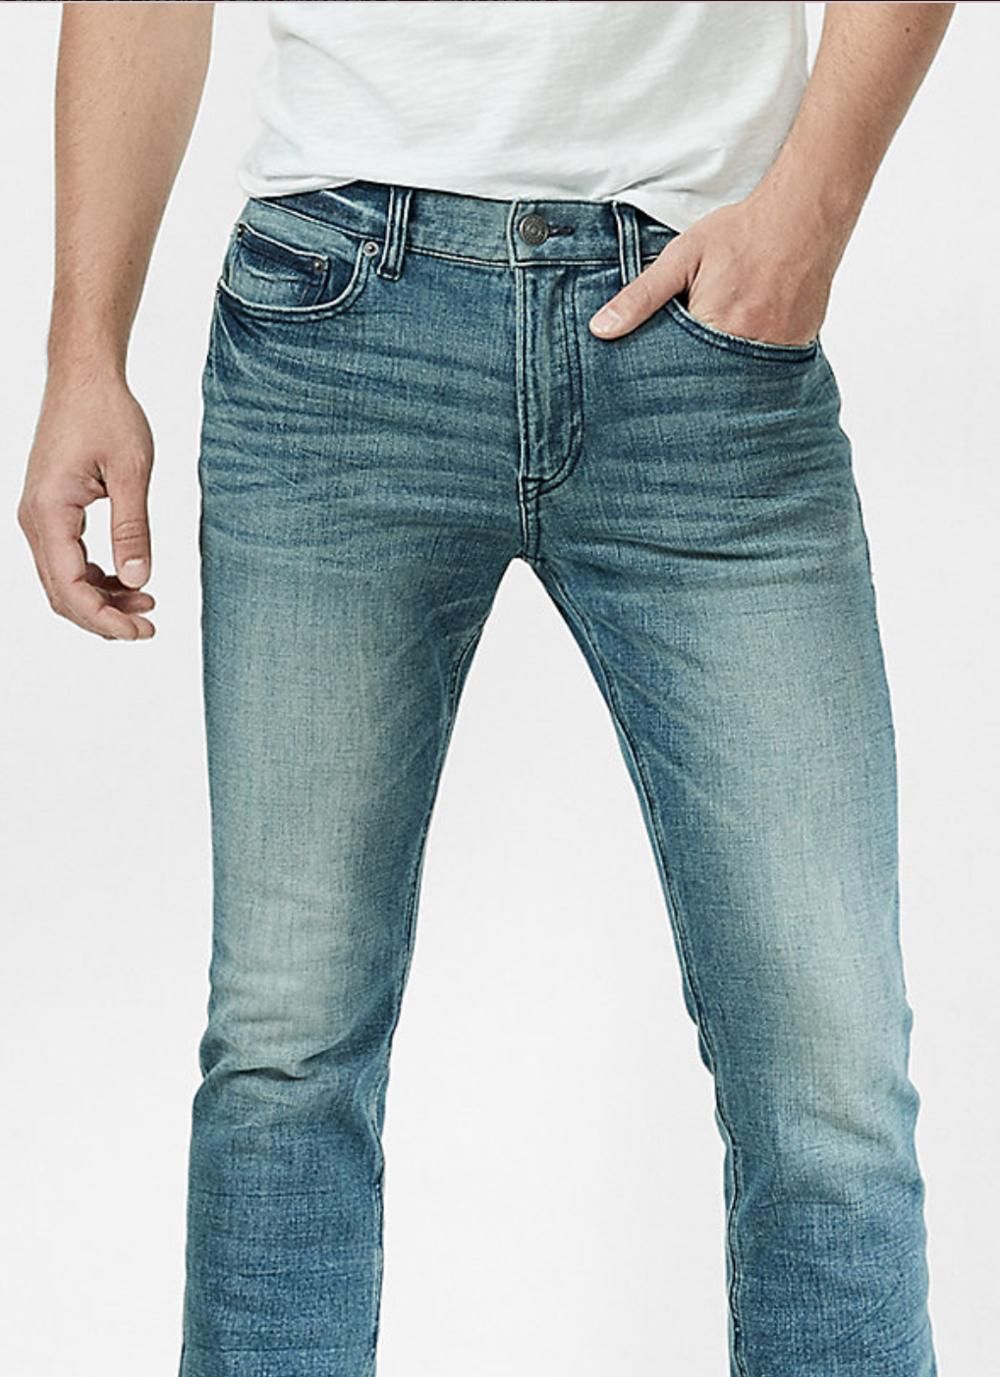 Slim Medium Wash 4 Way Stretch Jeans, Size: 29/32 $52.80